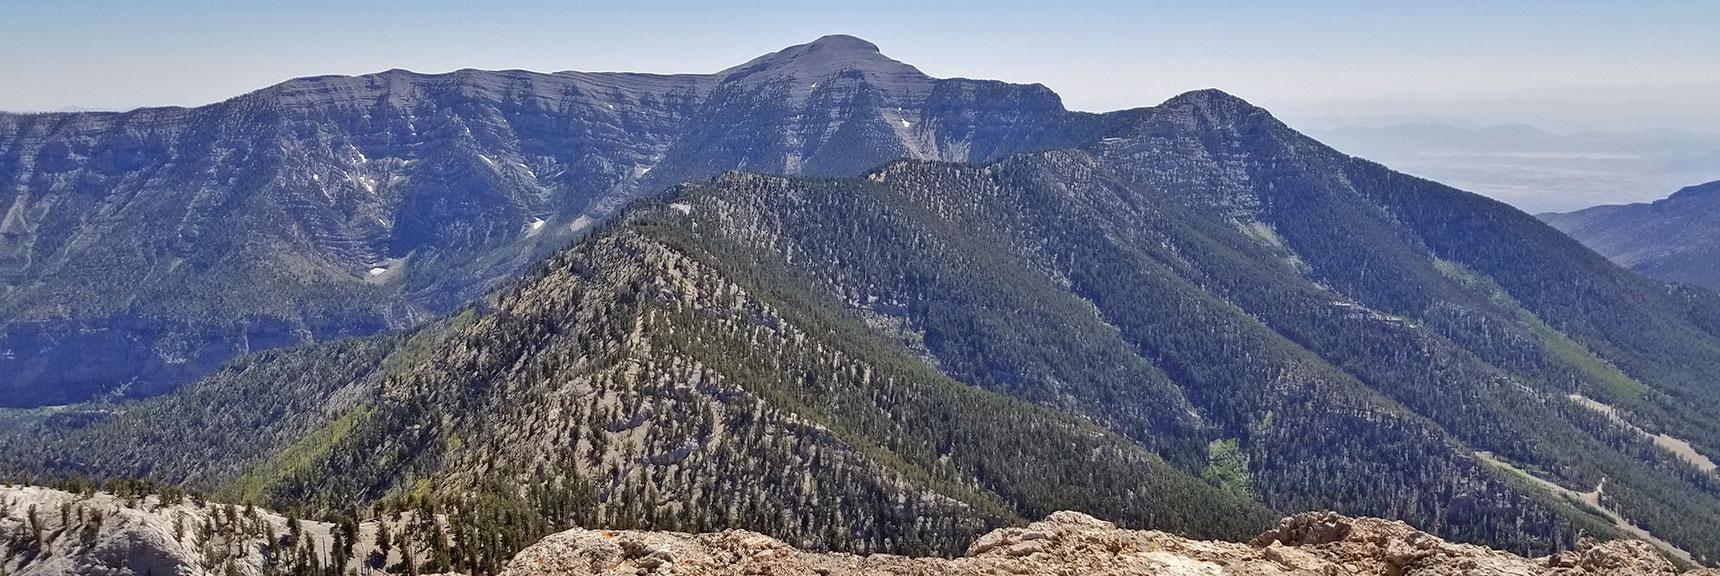 Charleston Peak, Lee Peak, North & South Ridge of Kyle Canyon from Mummy Mountain Summit   Mummy Mountain Adventure with Glenn & Shoshi Hall, Spring Mountains Wilderness, Nevada 012